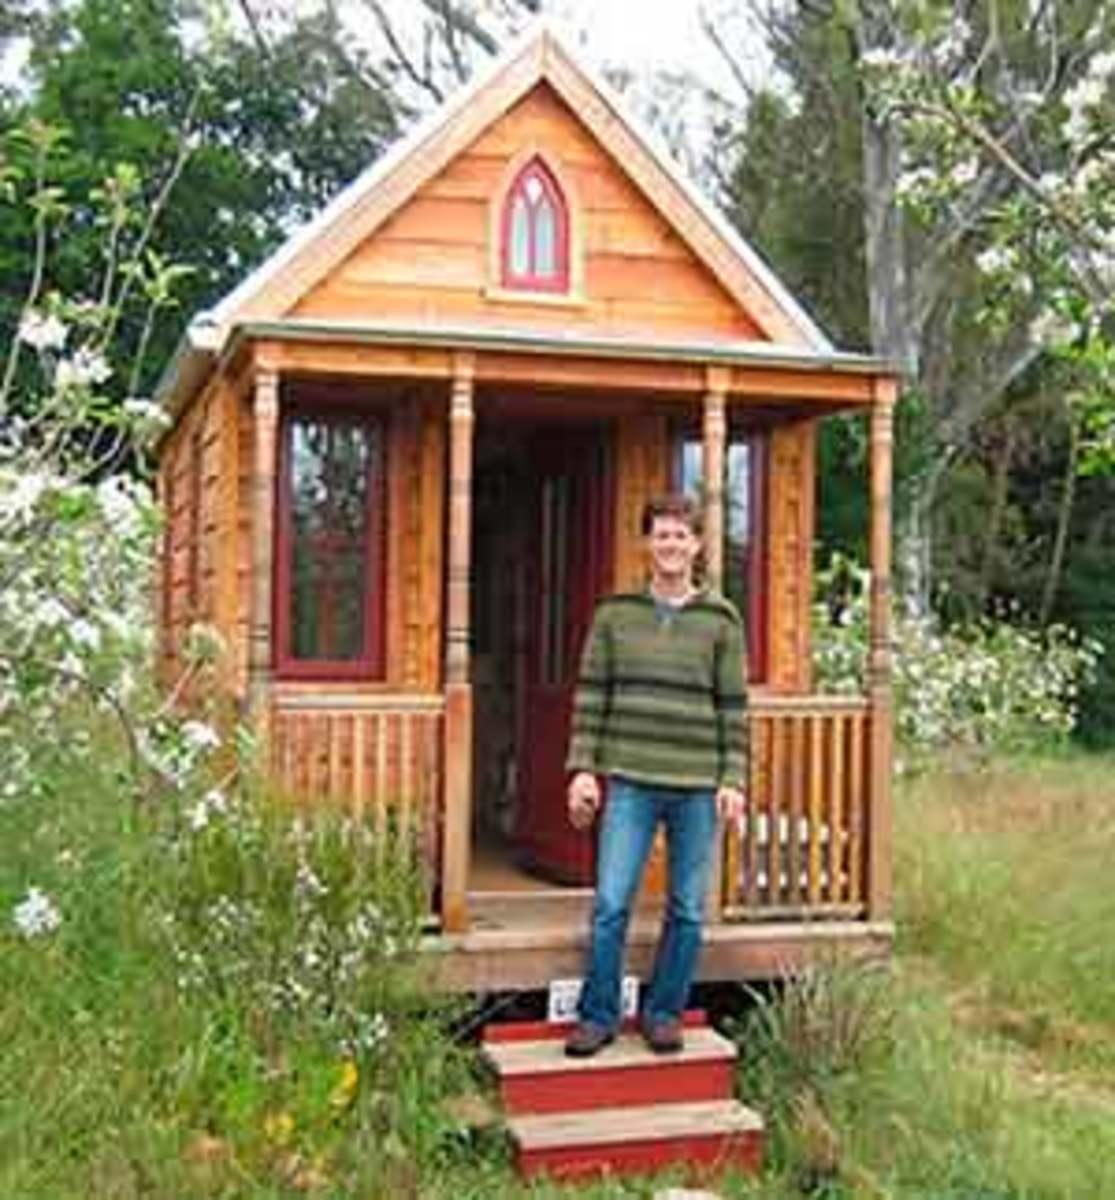 Jay Schaeffer of Tumbleweed Tiny Homes